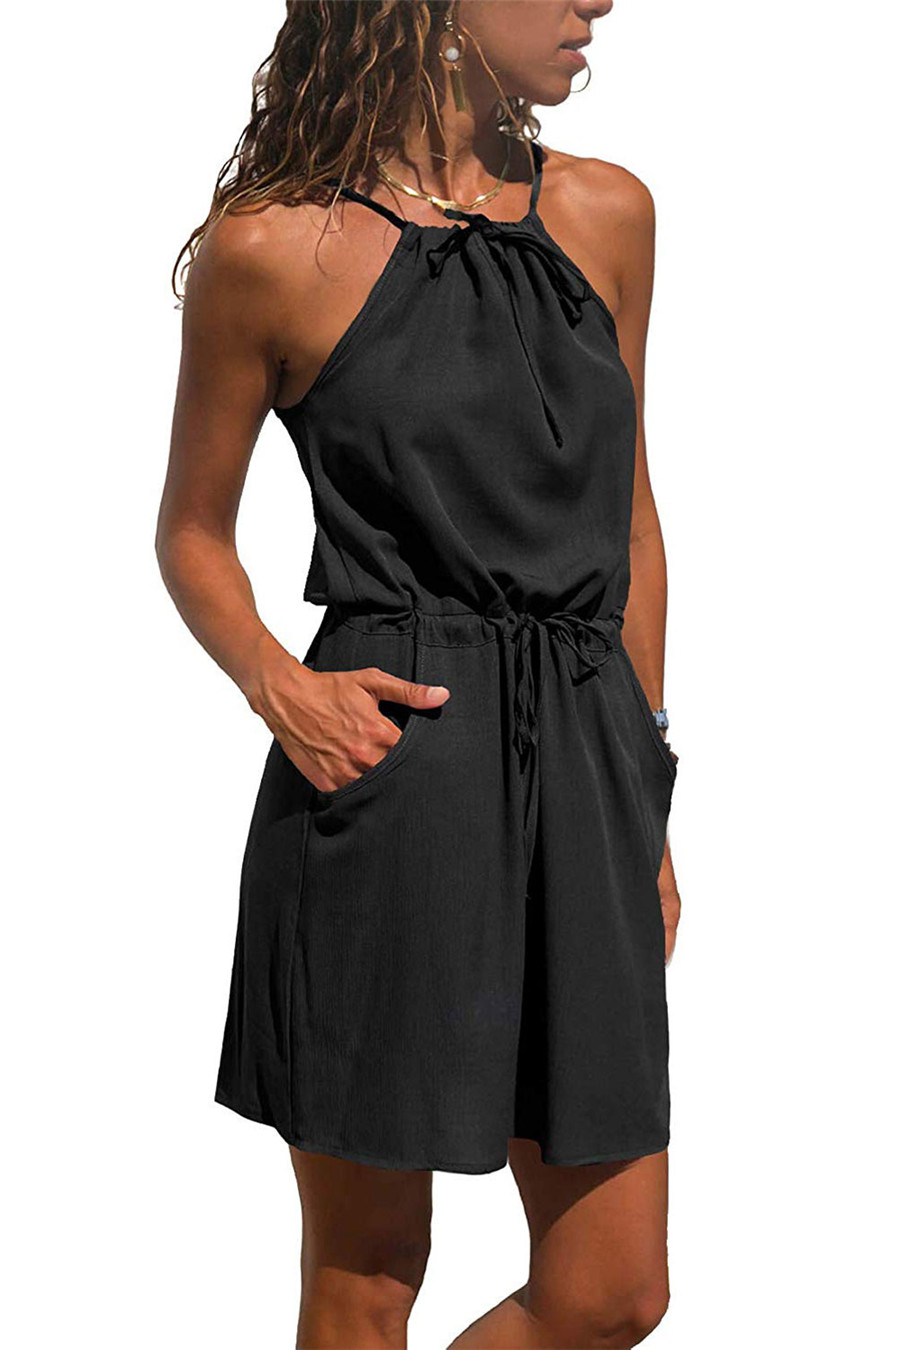 Gladiolus Chiffon Women Summer Dress Spaghetti Strap Floral Print Pocket Sexy Bohemian Beach Dress 2019 Short Ladies Dresses (42)